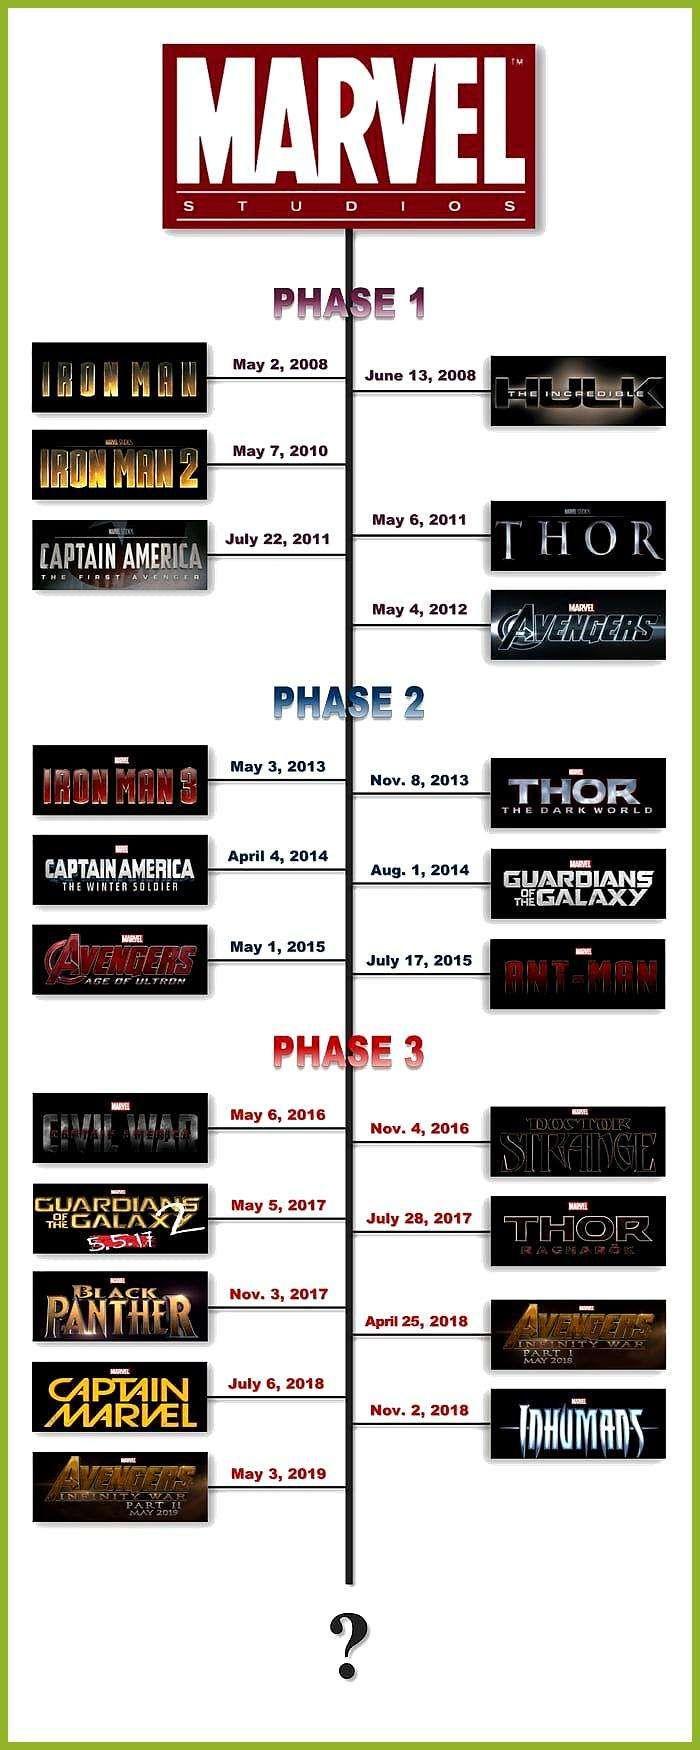 Sieh Die Filme Von Marvel Cinematic Universe In Chronologischer Reihenfolge Chronolog Marvel Cinematic Universe Movies Marvel Movie Releases Ultimate Marvel